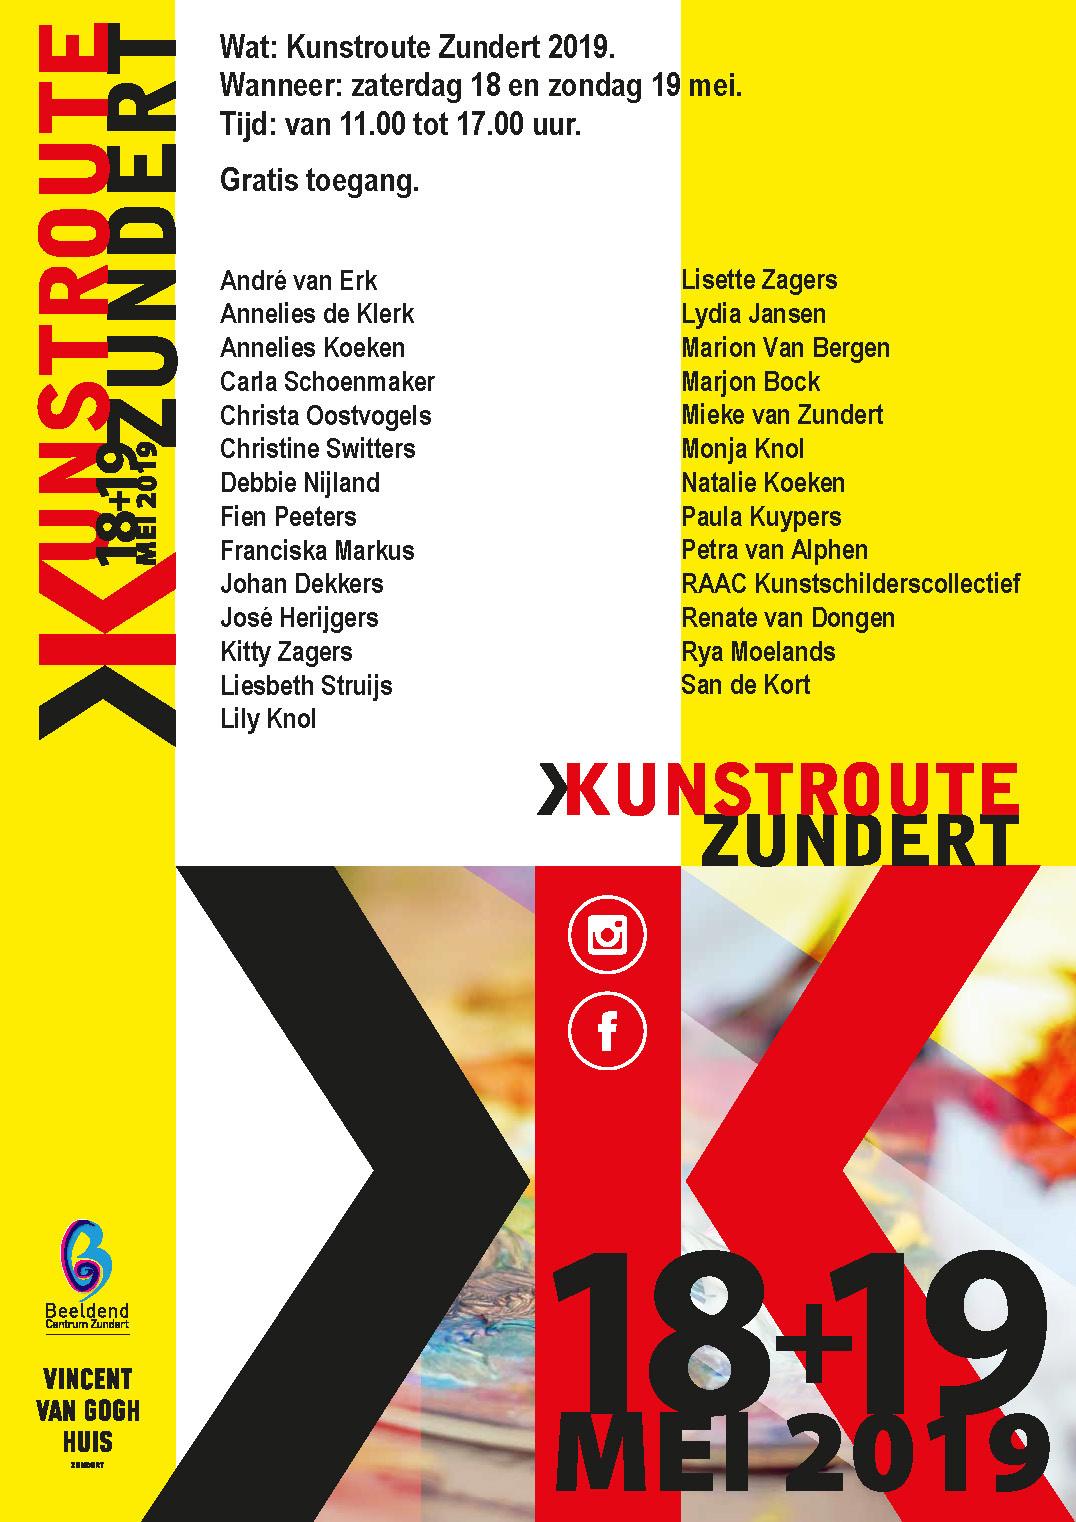 Kunstroute Zundert 2019